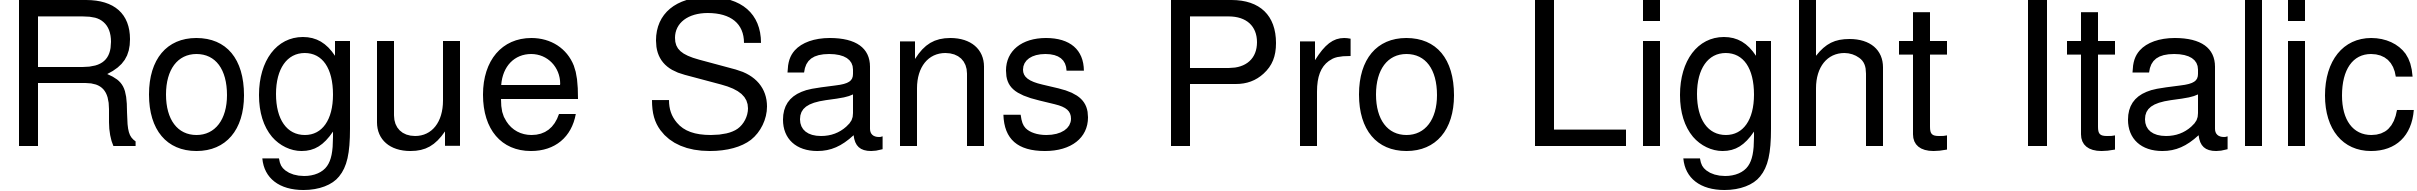 Rogue Sans Pro Light Italic